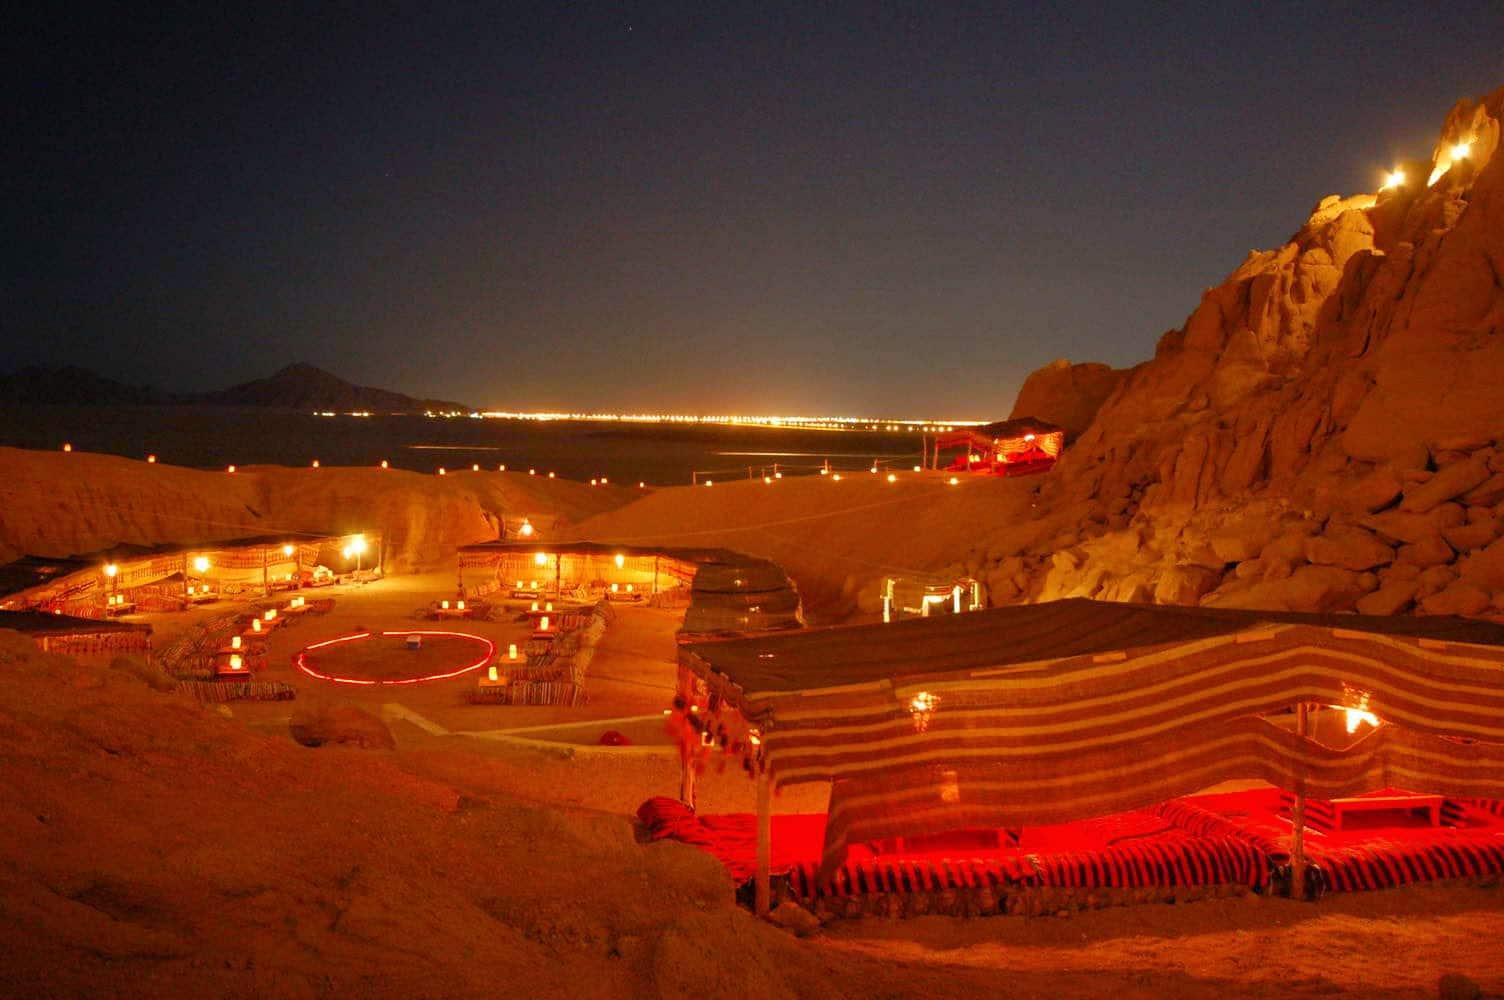 I migliori posti turistici a Sharm El Sheikh